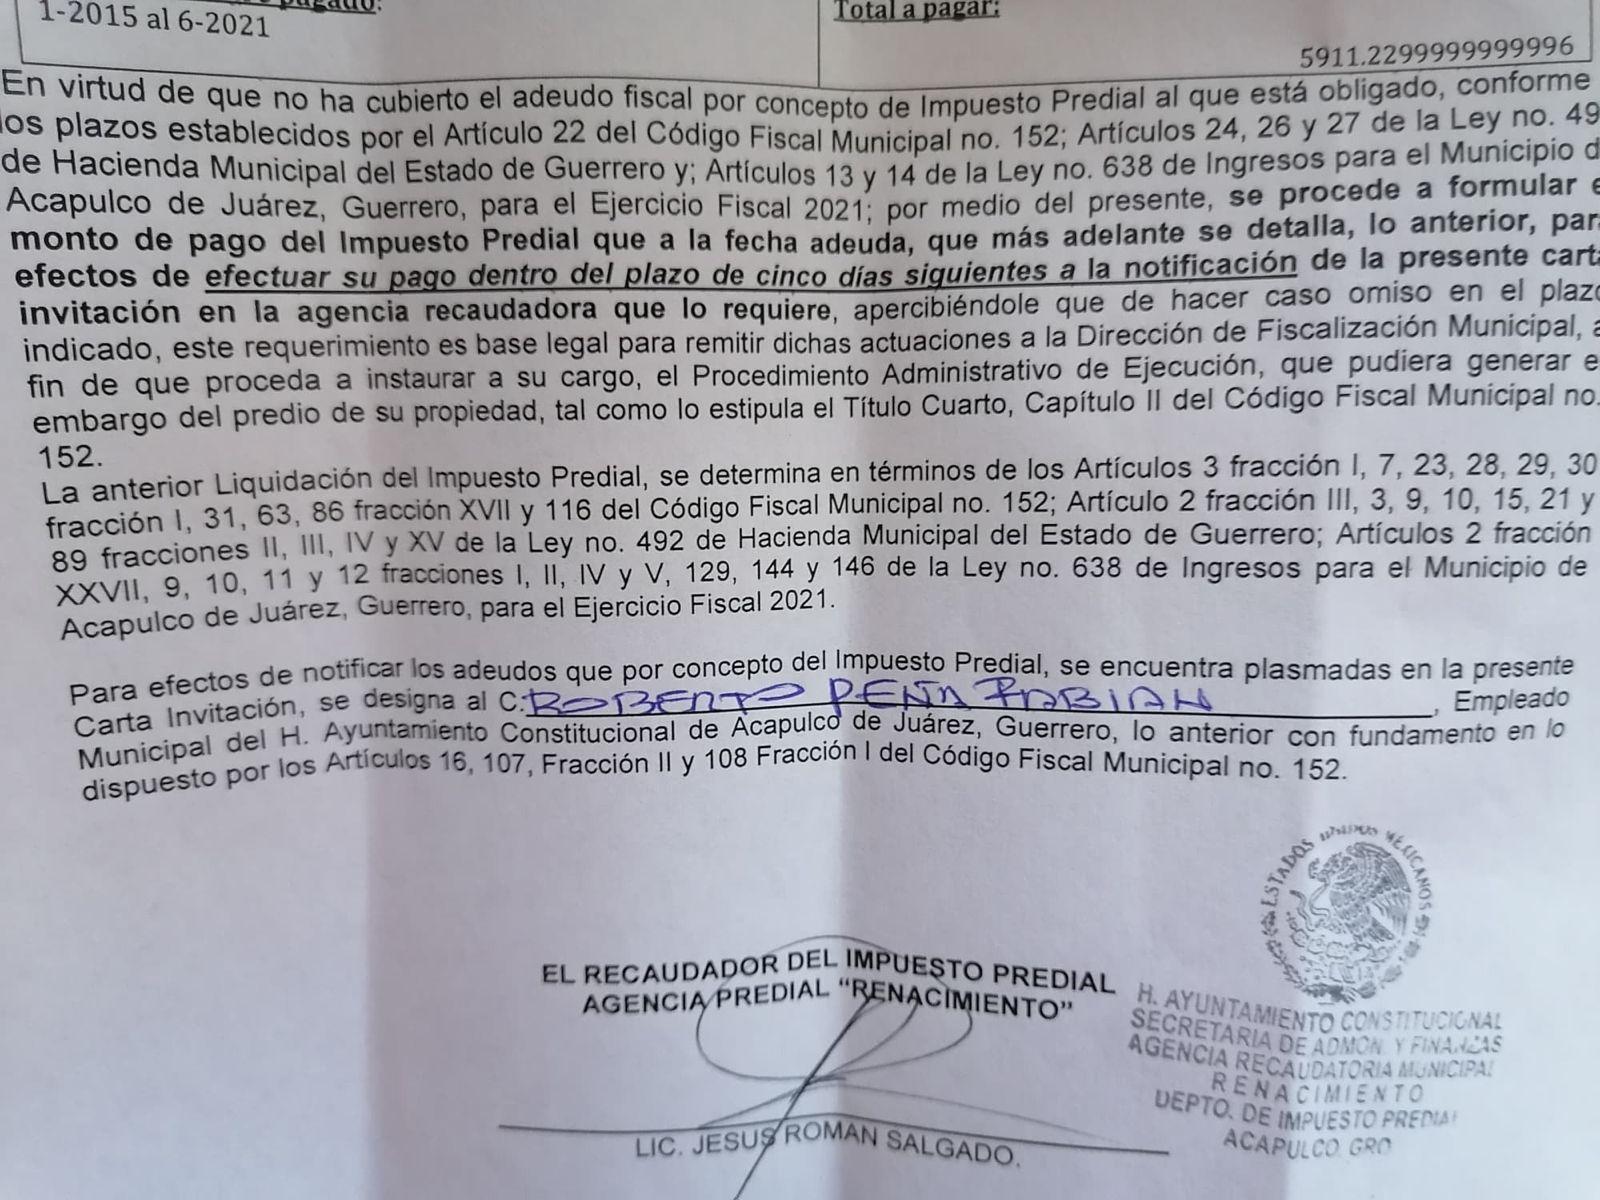 Alcaldesa de Morena en Acapulco amenaza con embargar predios que adeuden predial 1